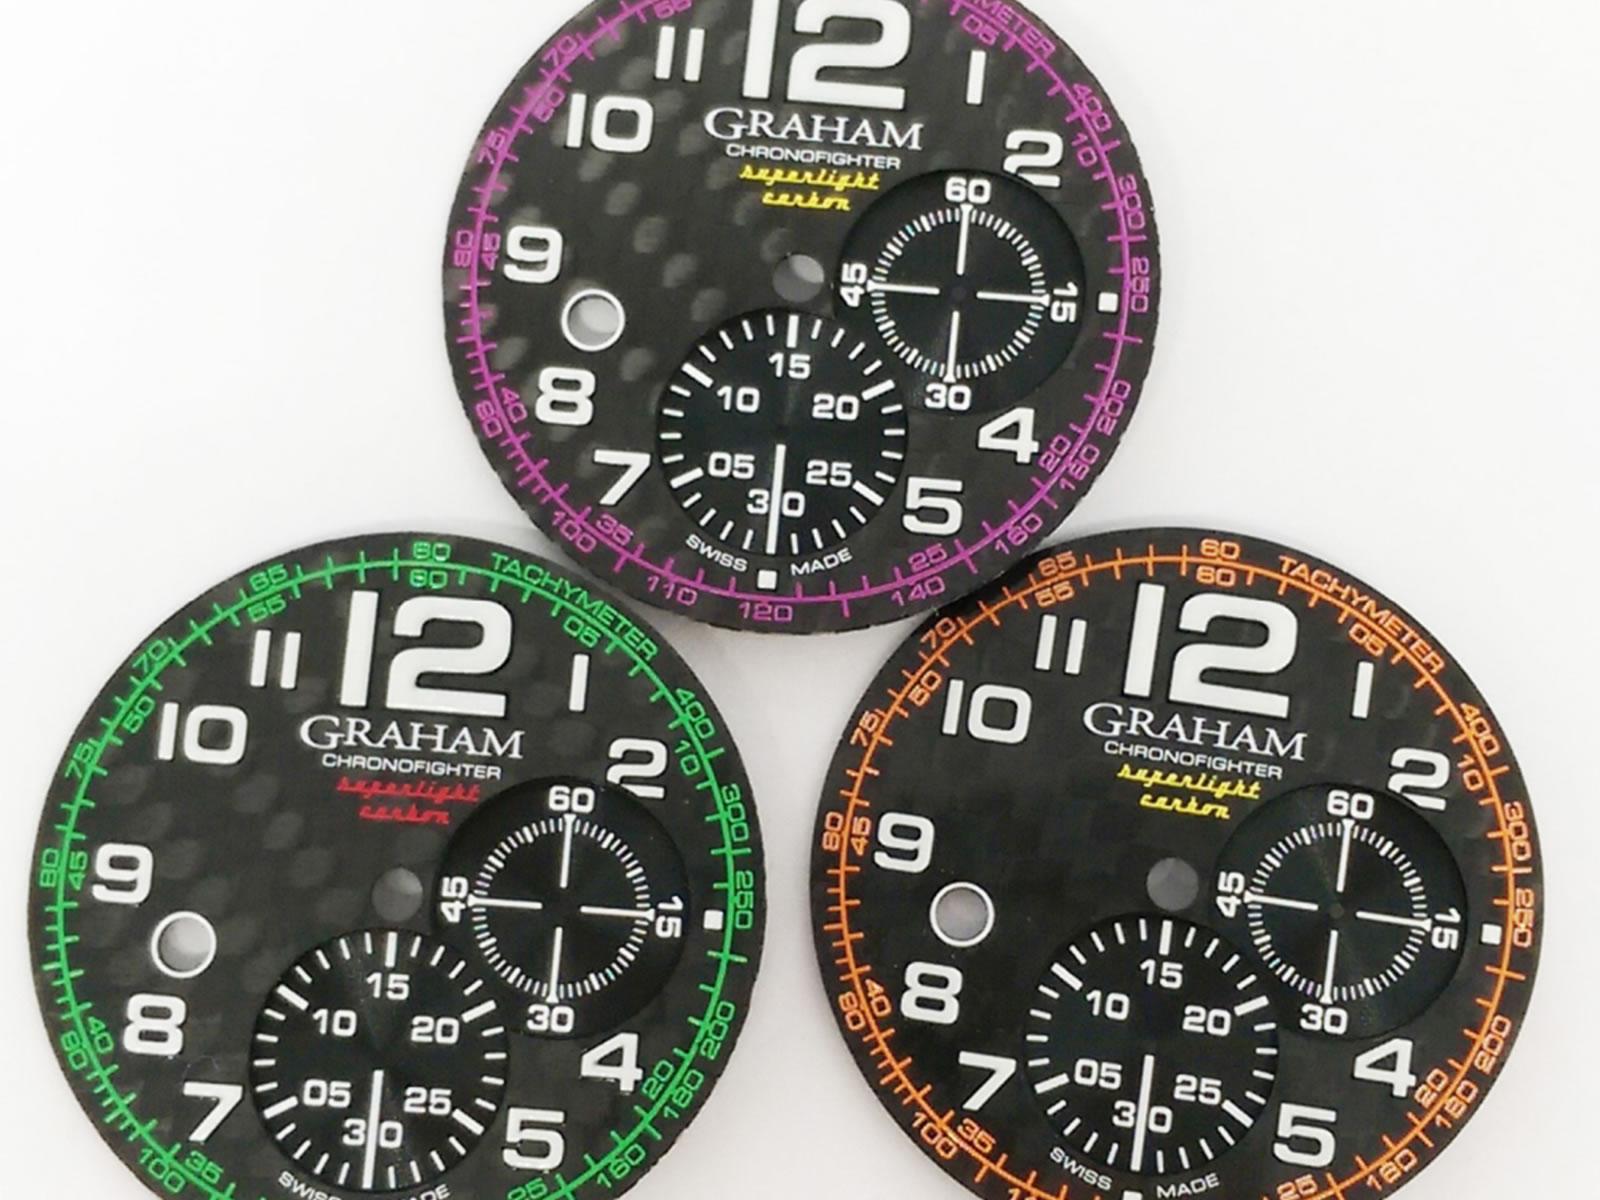 graham-chronofighter-superlight-carbon-true-colour-2-.jpg